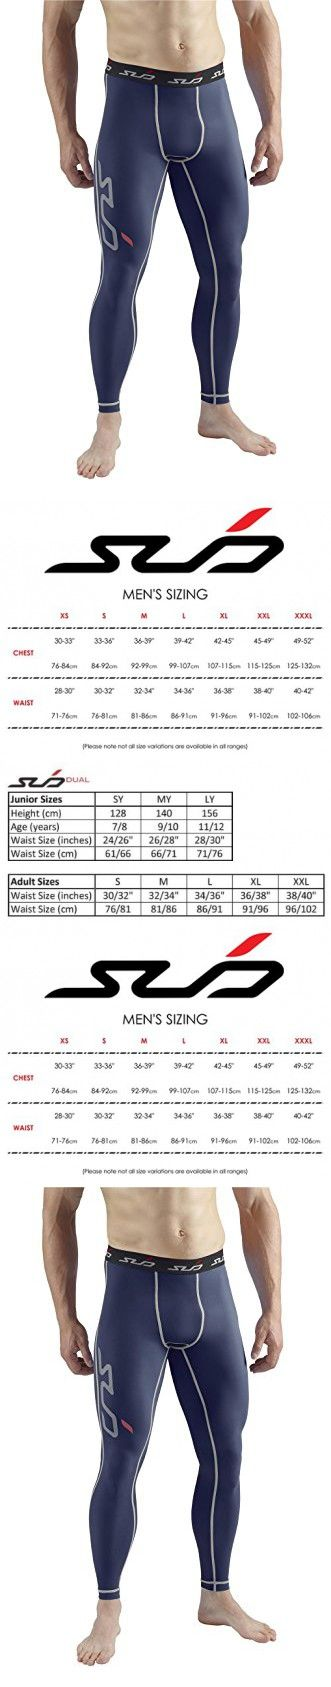 SUB Sports DUAL (All Season) Mens Compression Leggings / Pants - Base Layer Tights - Navy - XL